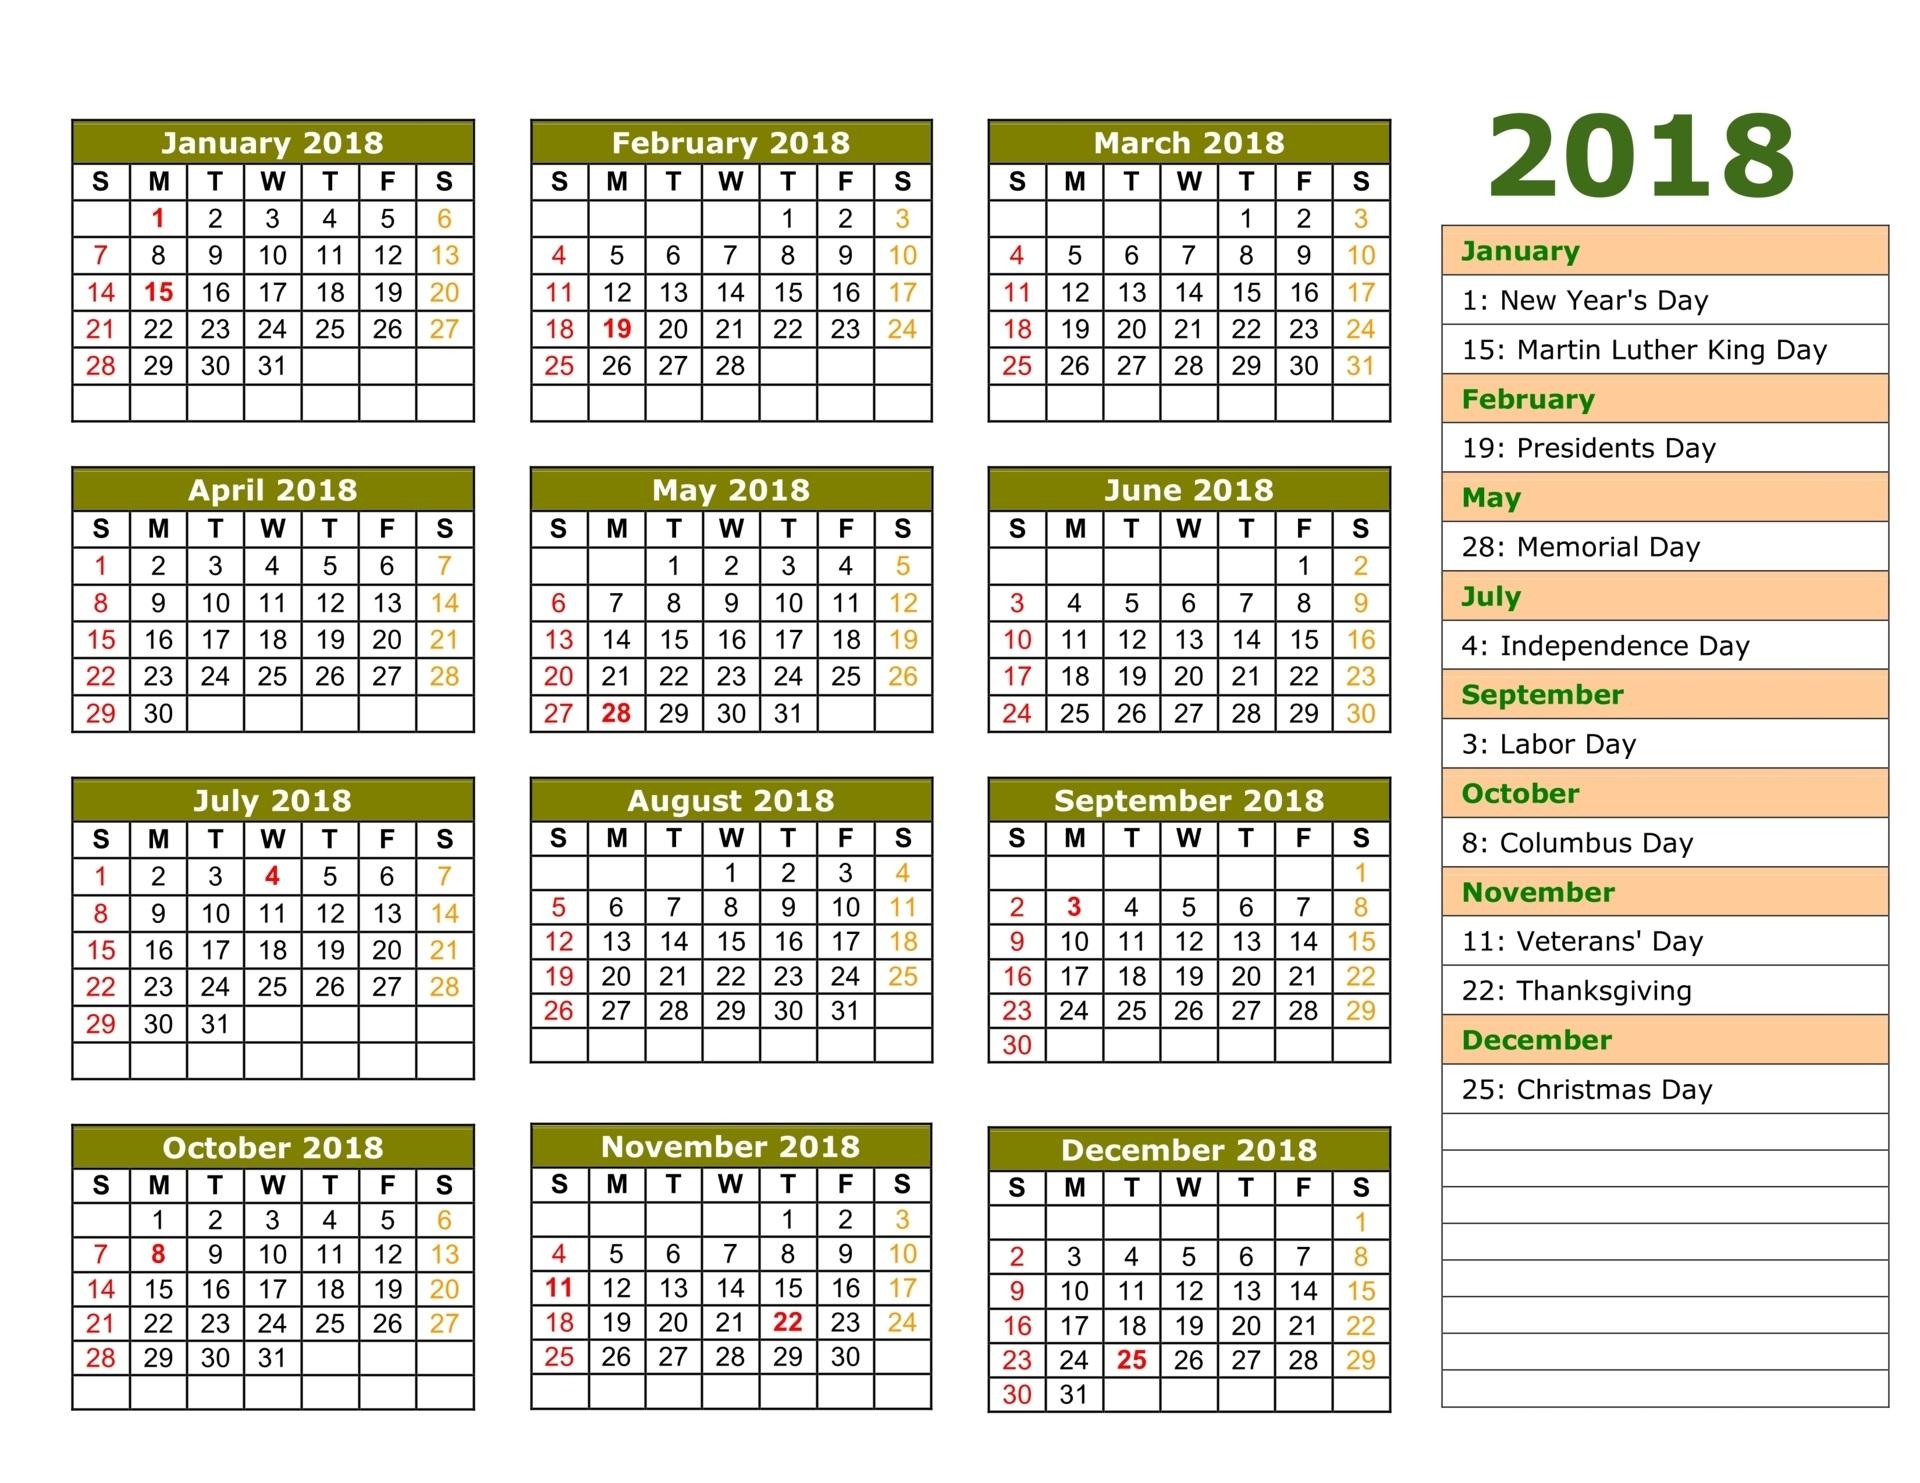 Islamic Calendar 2018 | Hijri Calendar 1439 | [FREE} Printable